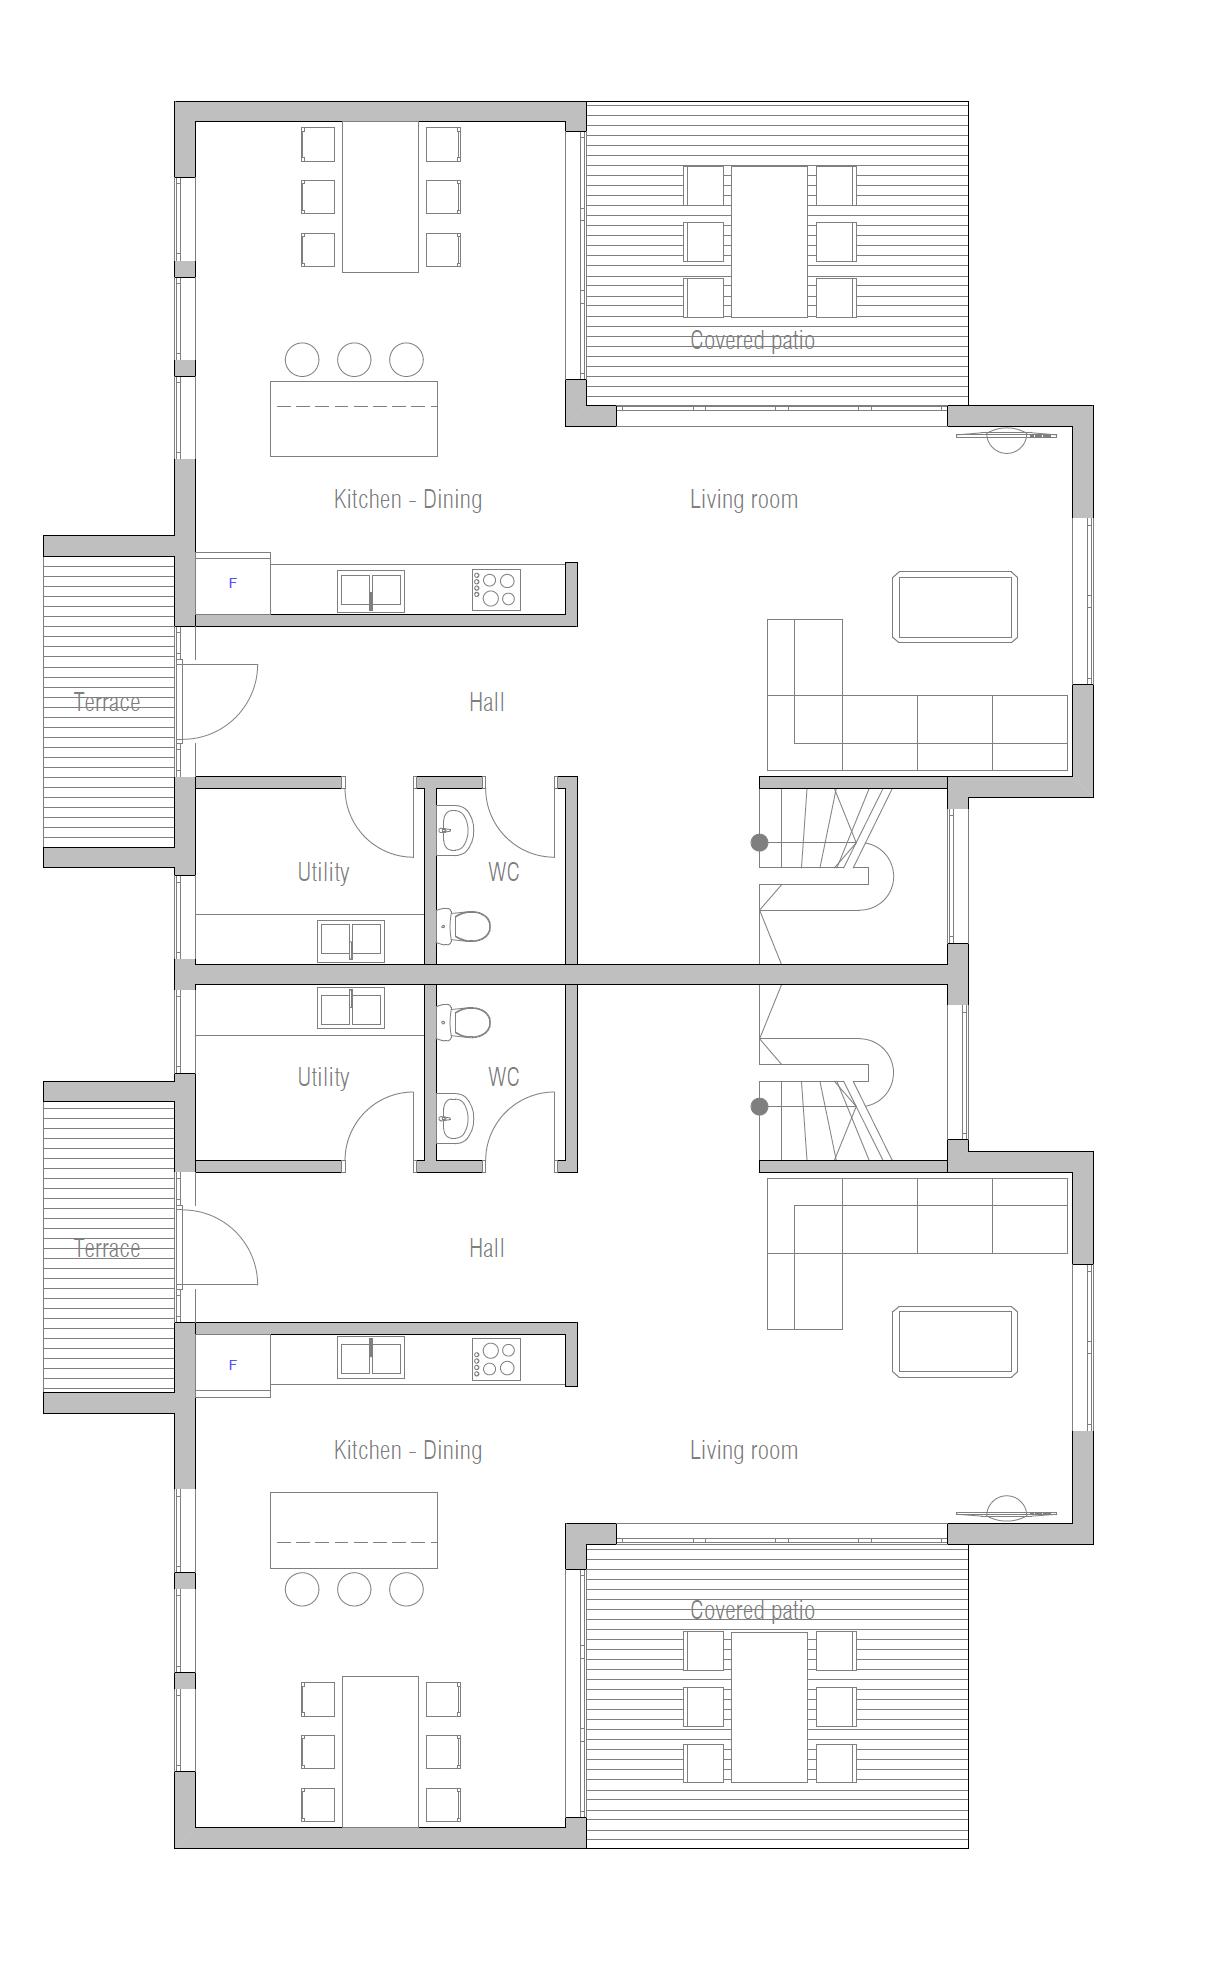 Duplex house plan ch287 house plan for New duplex house plans